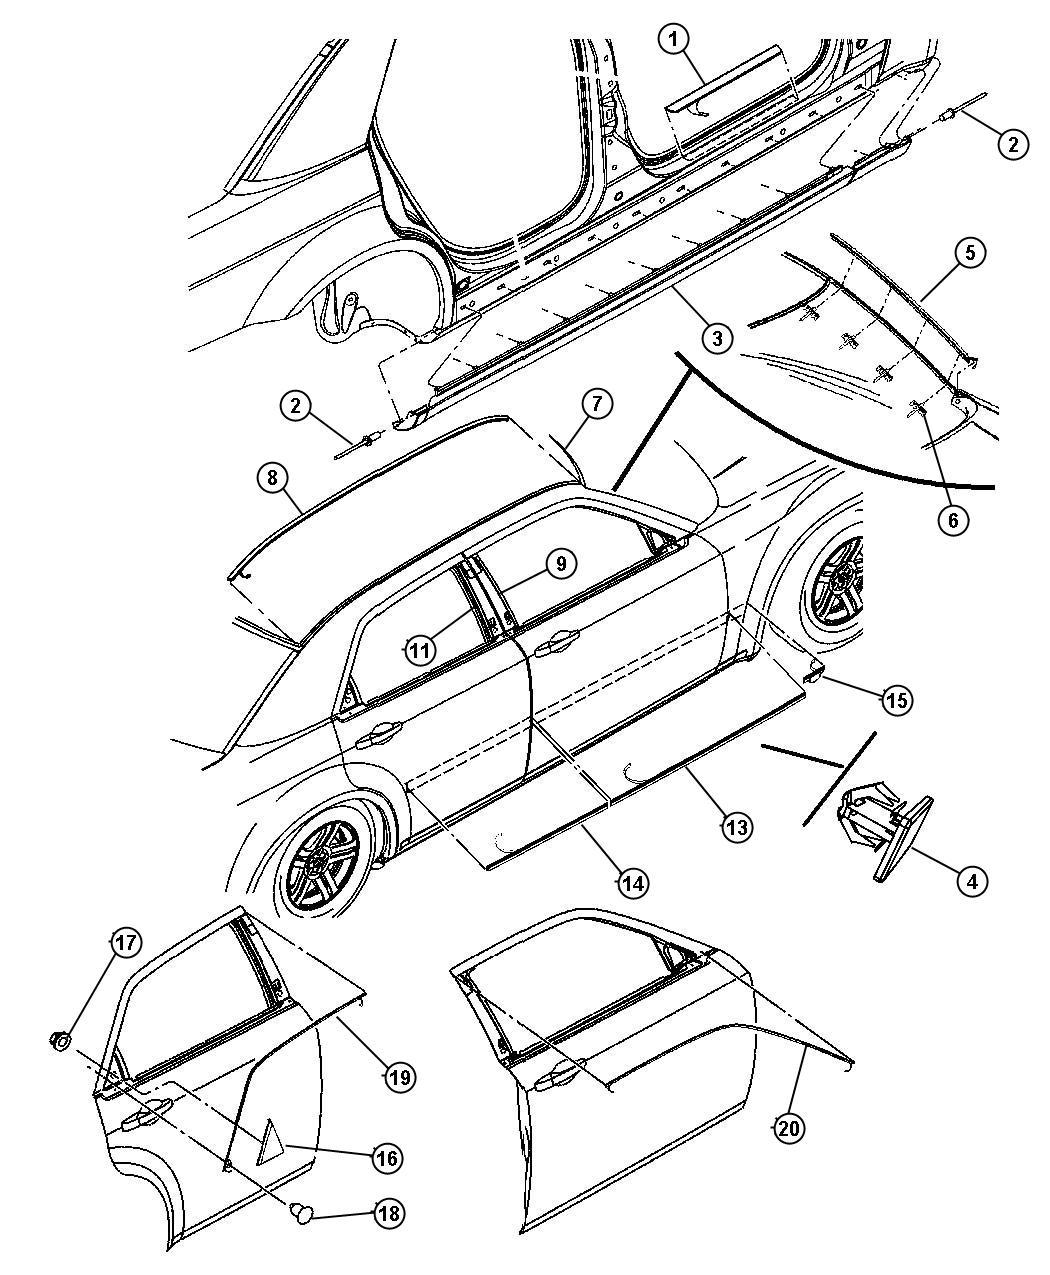 Oem 2005 Dodge Magnum Accessories Parts Online Factory